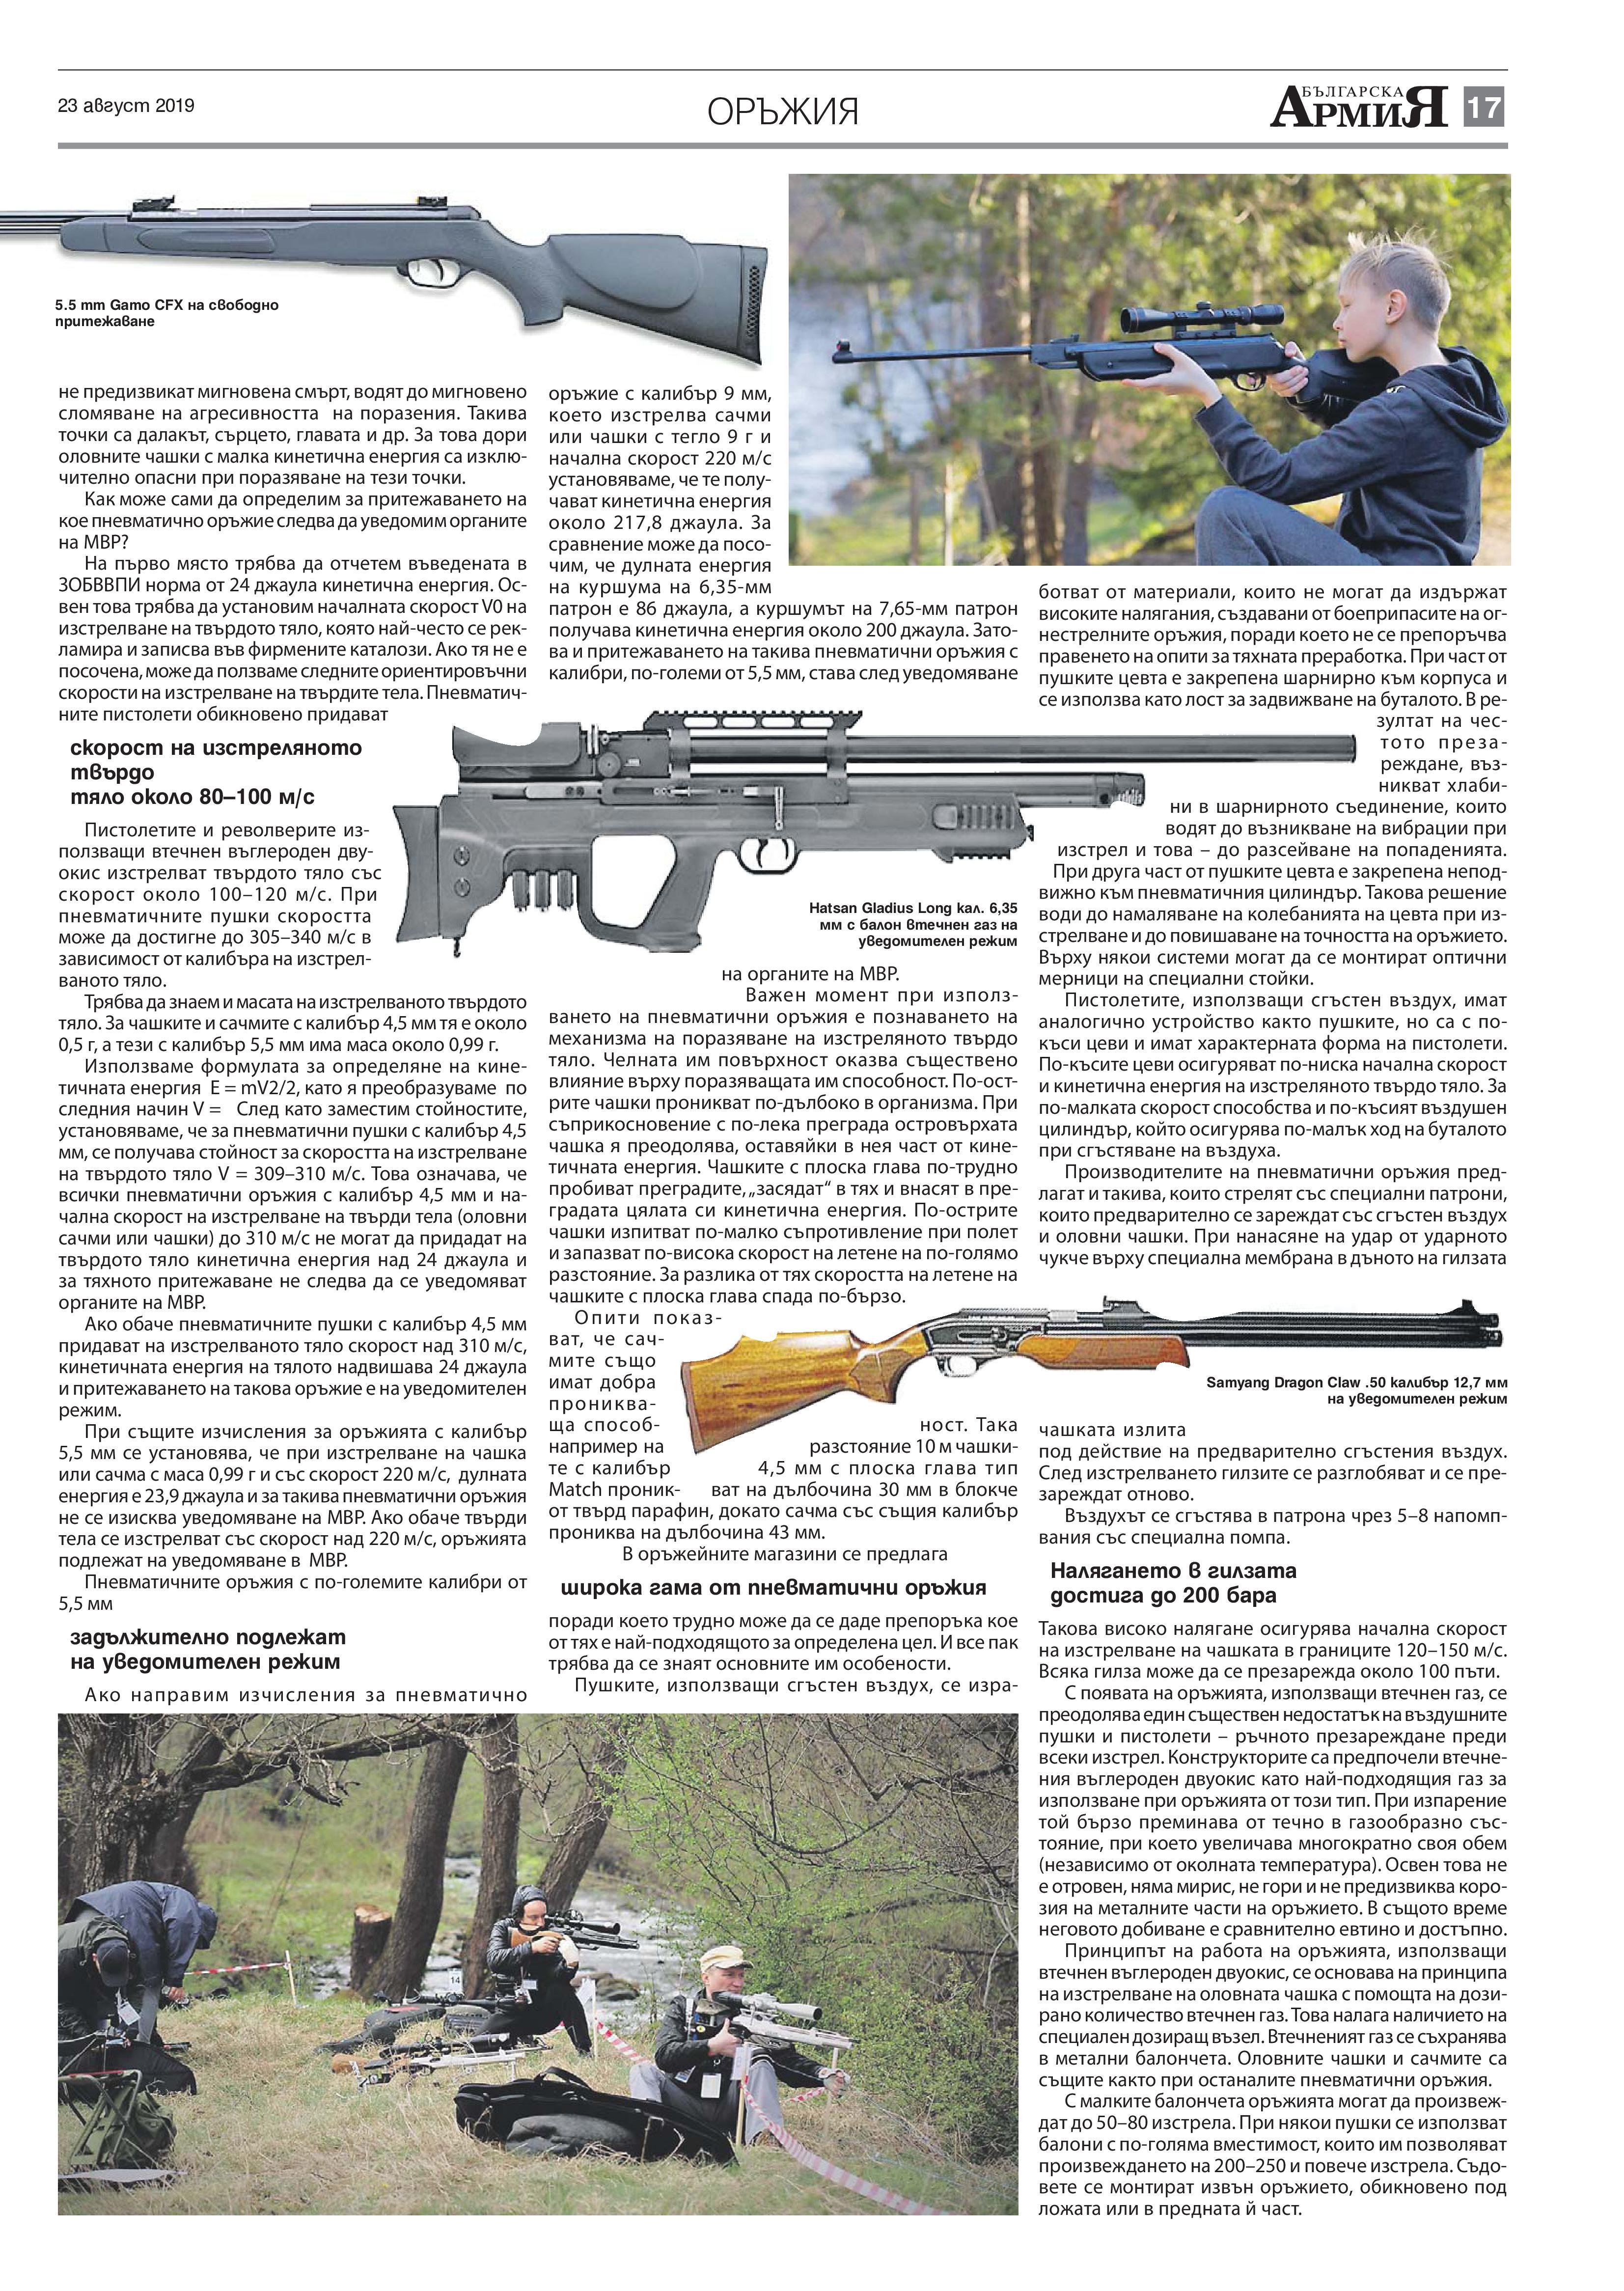 https://www.armymedia.bg/wp-content/uploads/2015/06/17-30.jpg